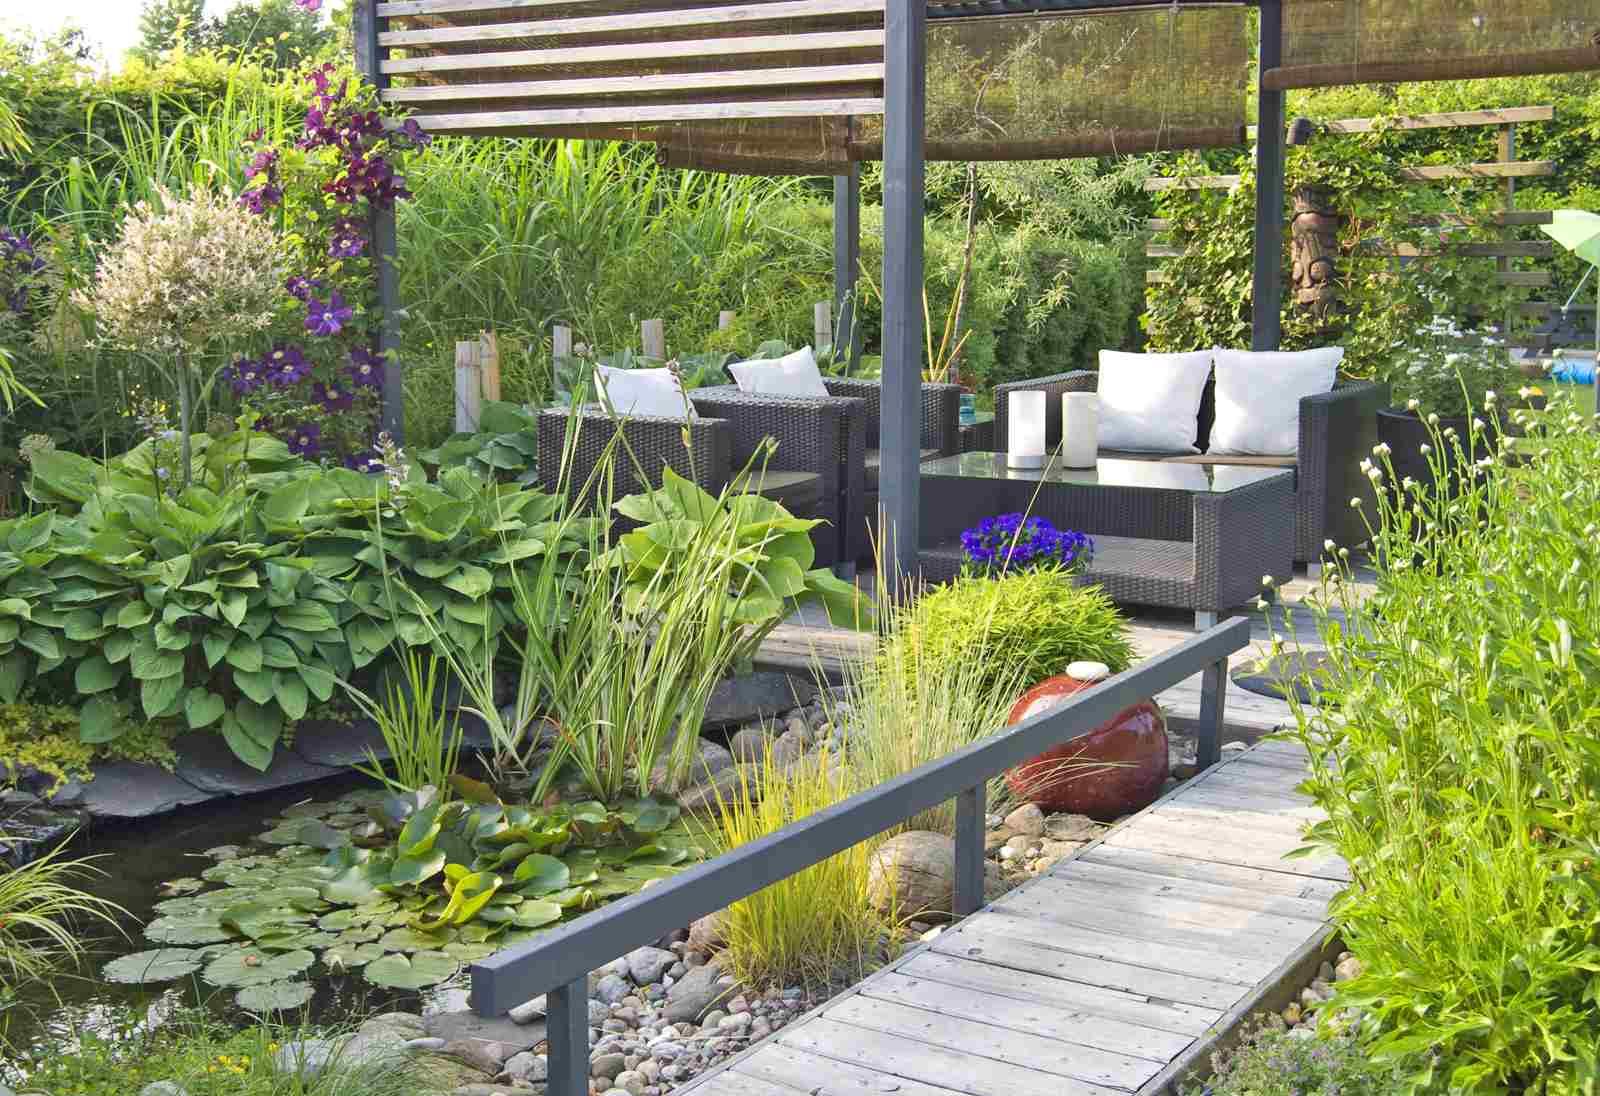 Water Garden and Deck